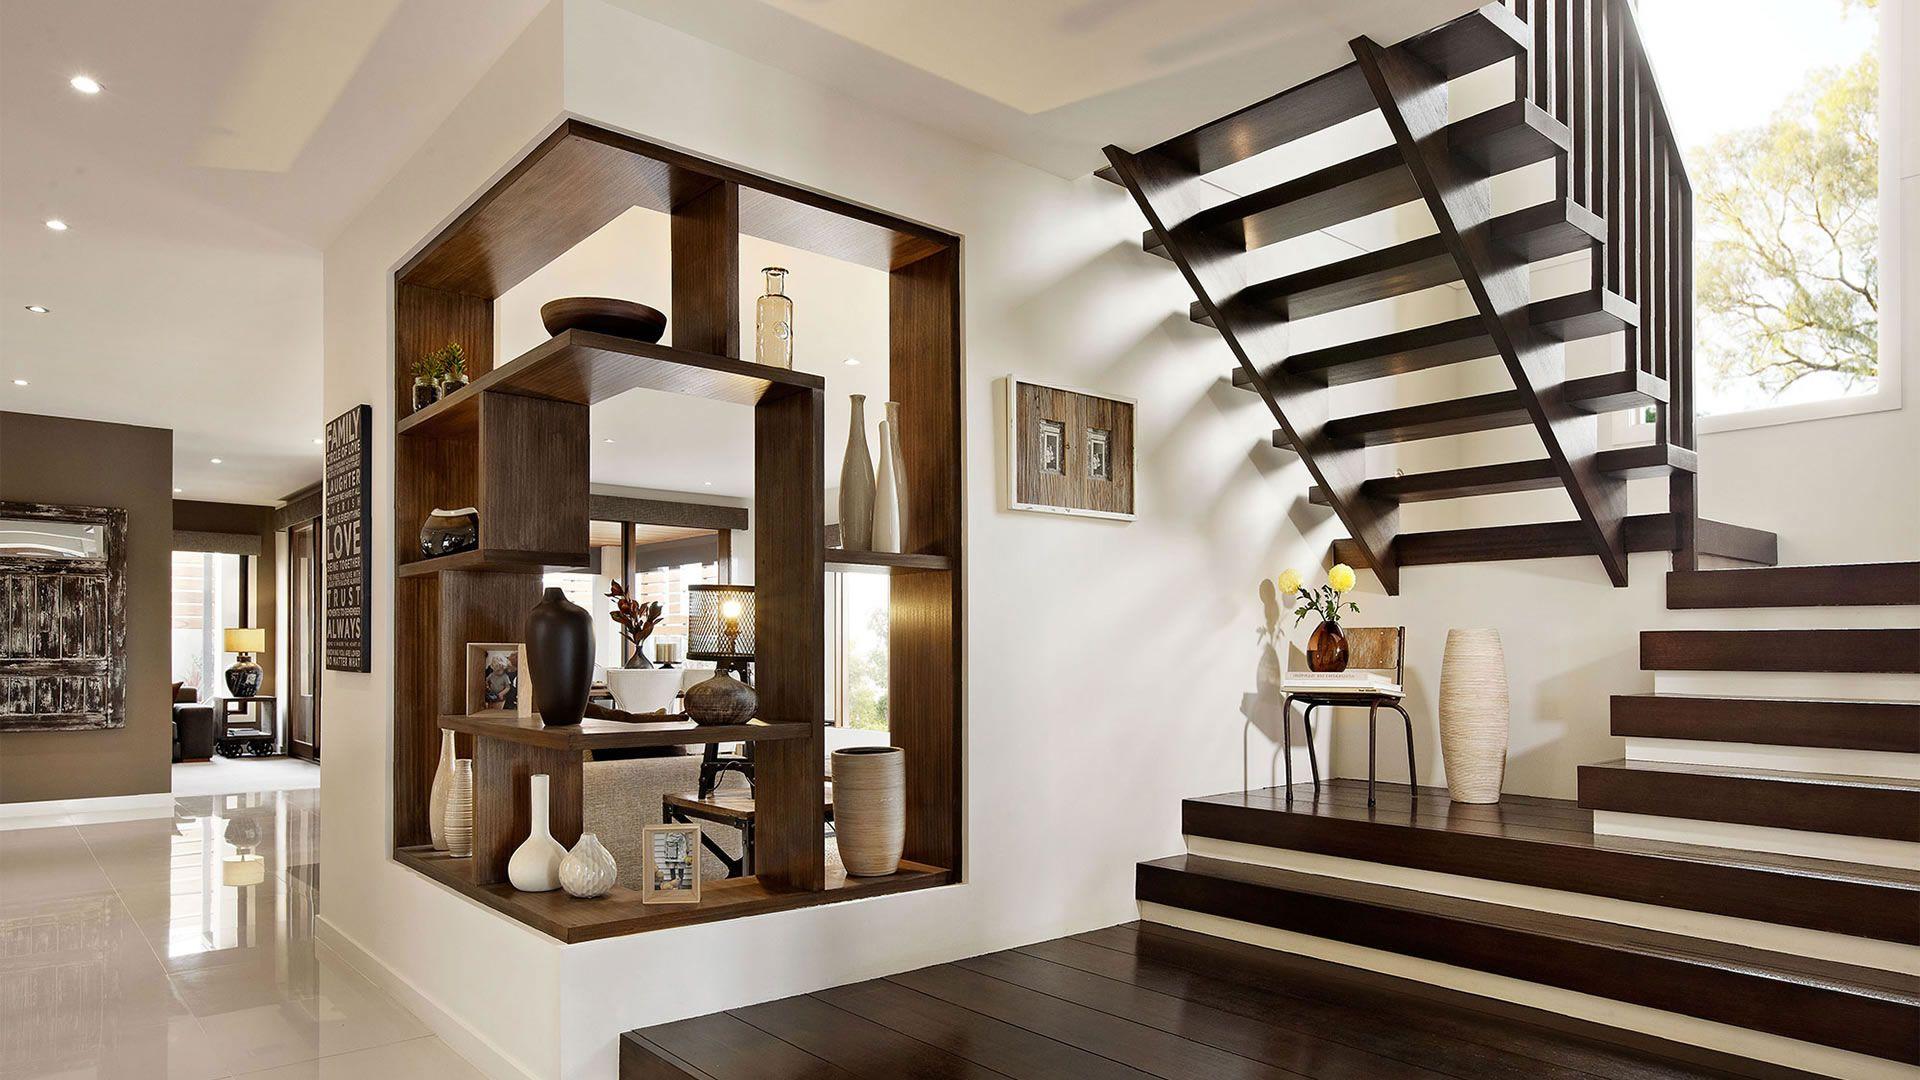 Barwon MK2 by Carlisle Homes 18 Interior Residential